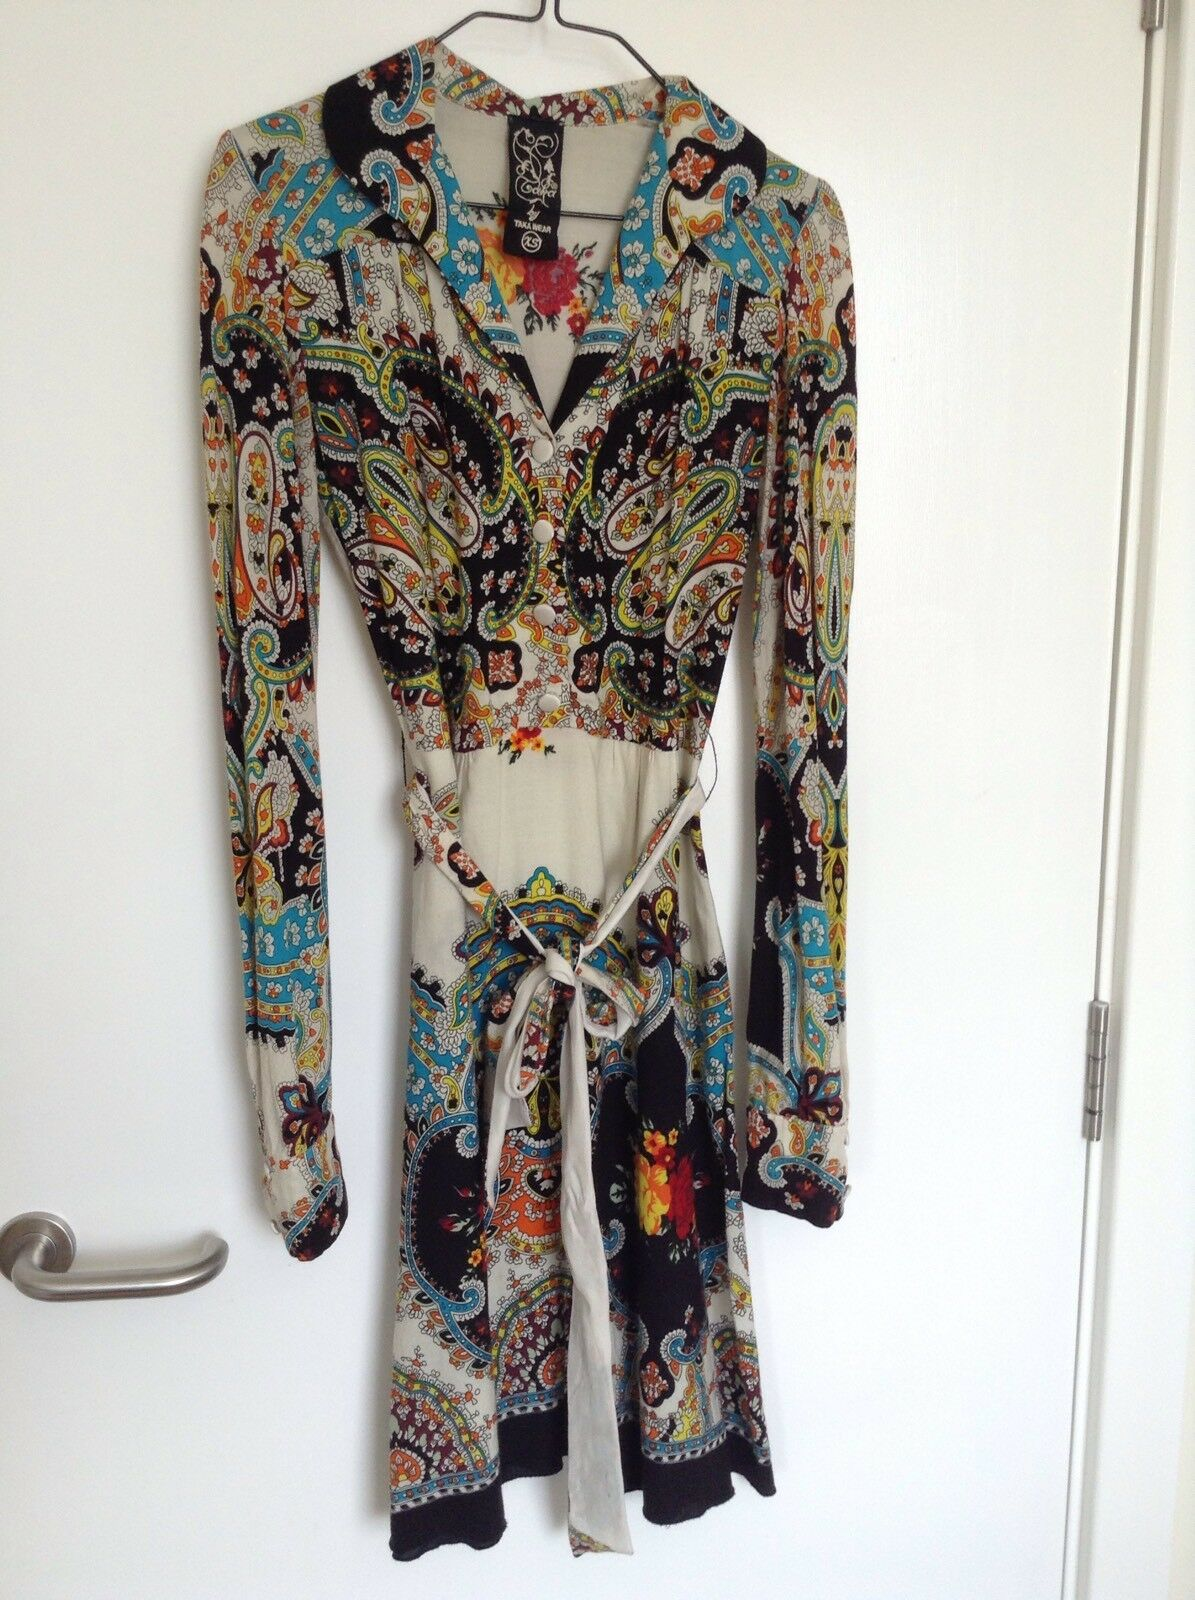 Taka Wear Fine Wool Crepe Ethnic Boho Floral Dress Size XS Or Uk 6 8